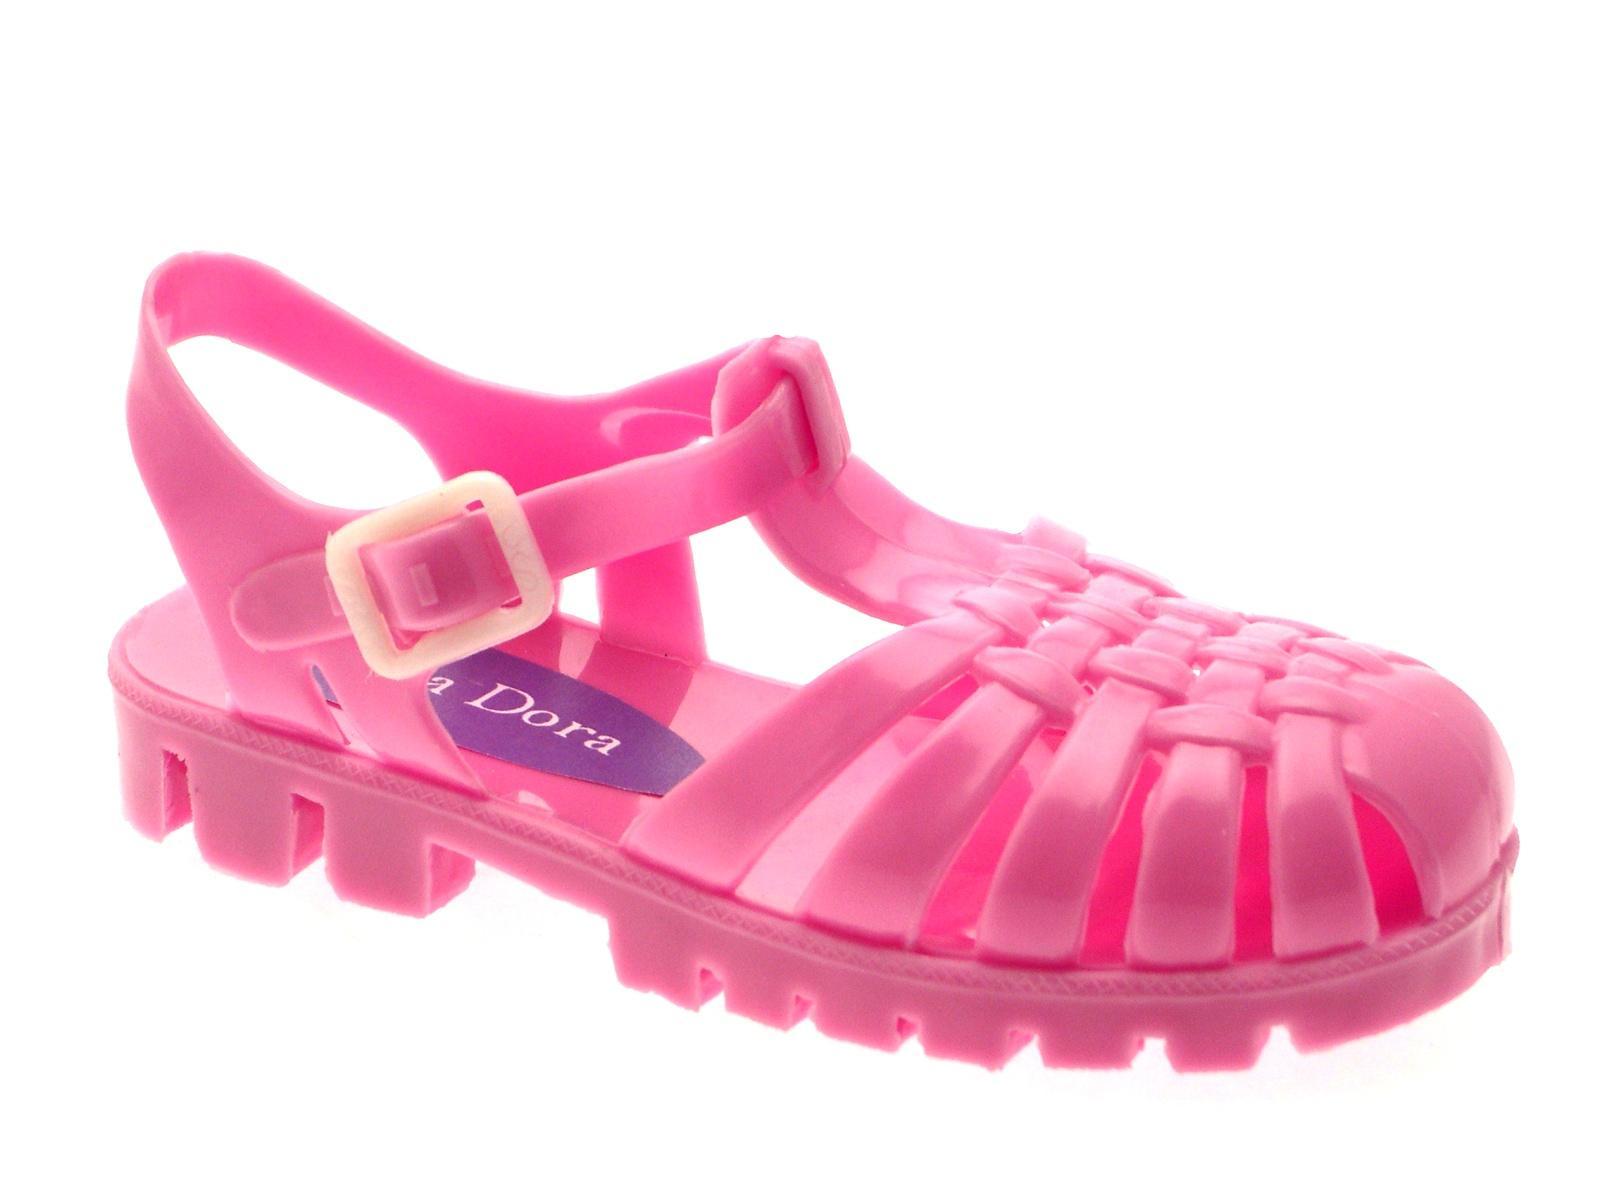 Jelly Flat Shoes Uk